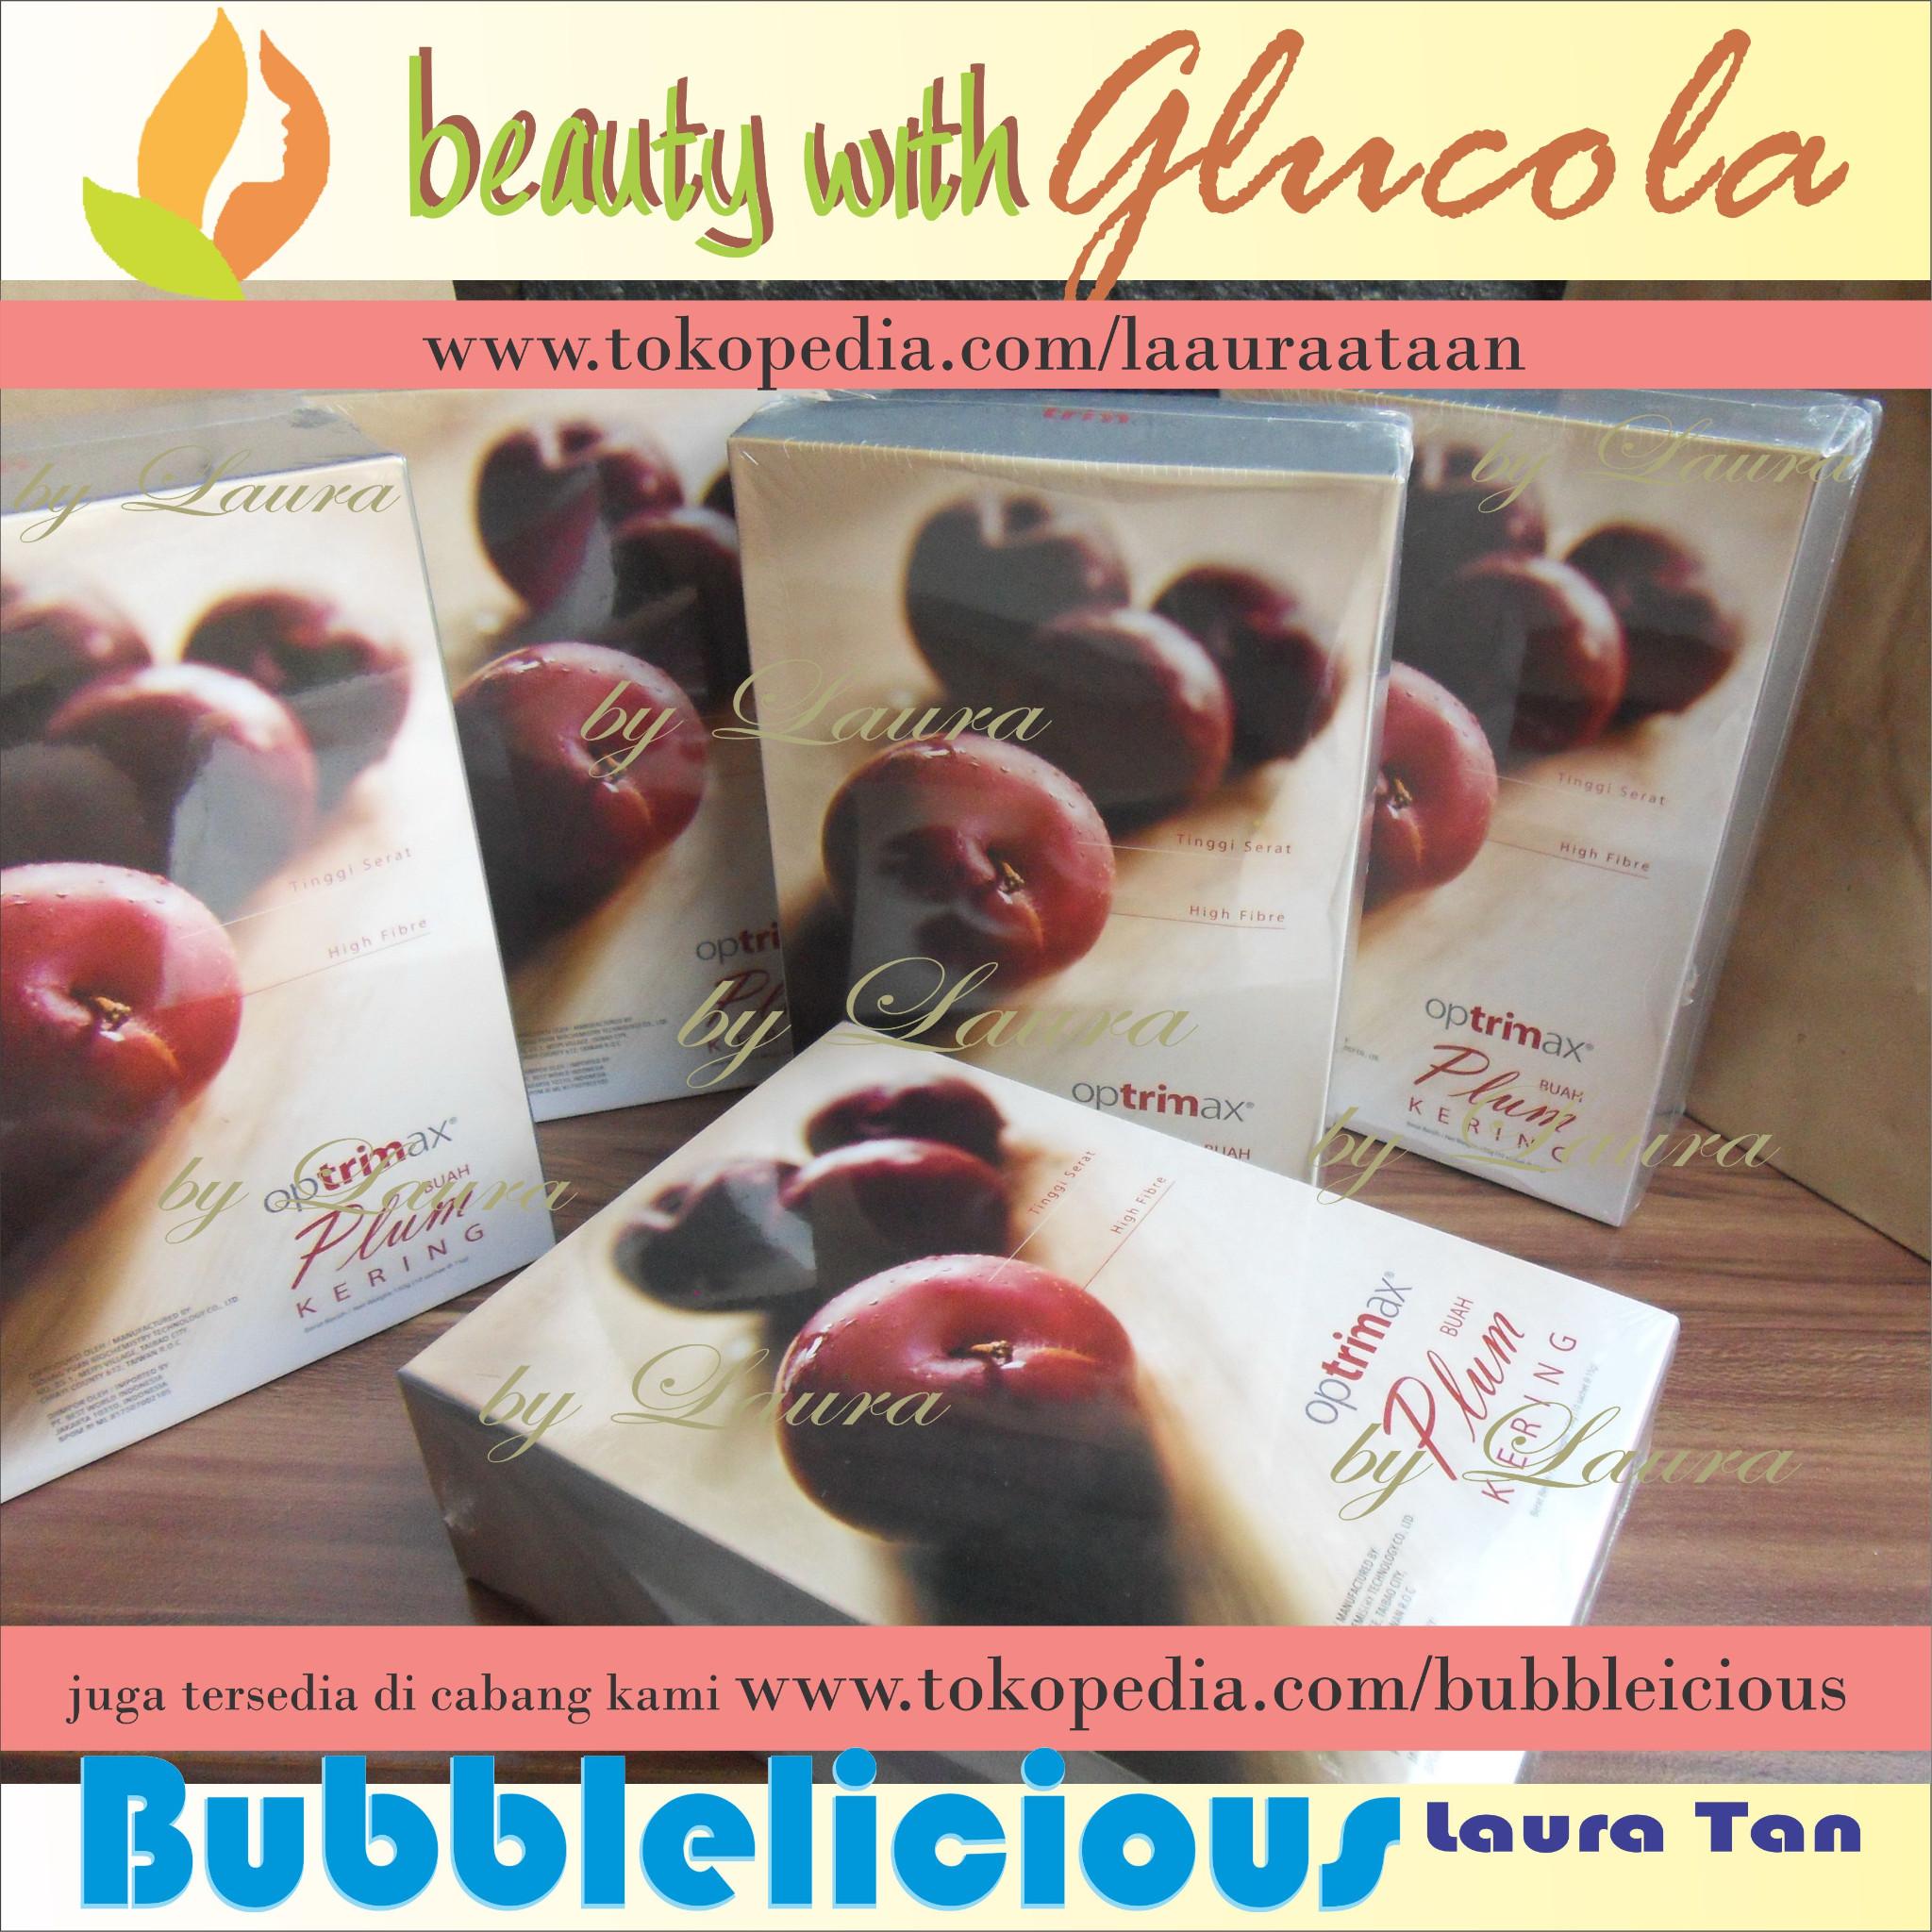 Optrimax Buah Plum Kering 3 Sachet Daftar Harga Terkini Termurah 10 Jual 30s Dus Besar Beauty With Glucola Tokopedia